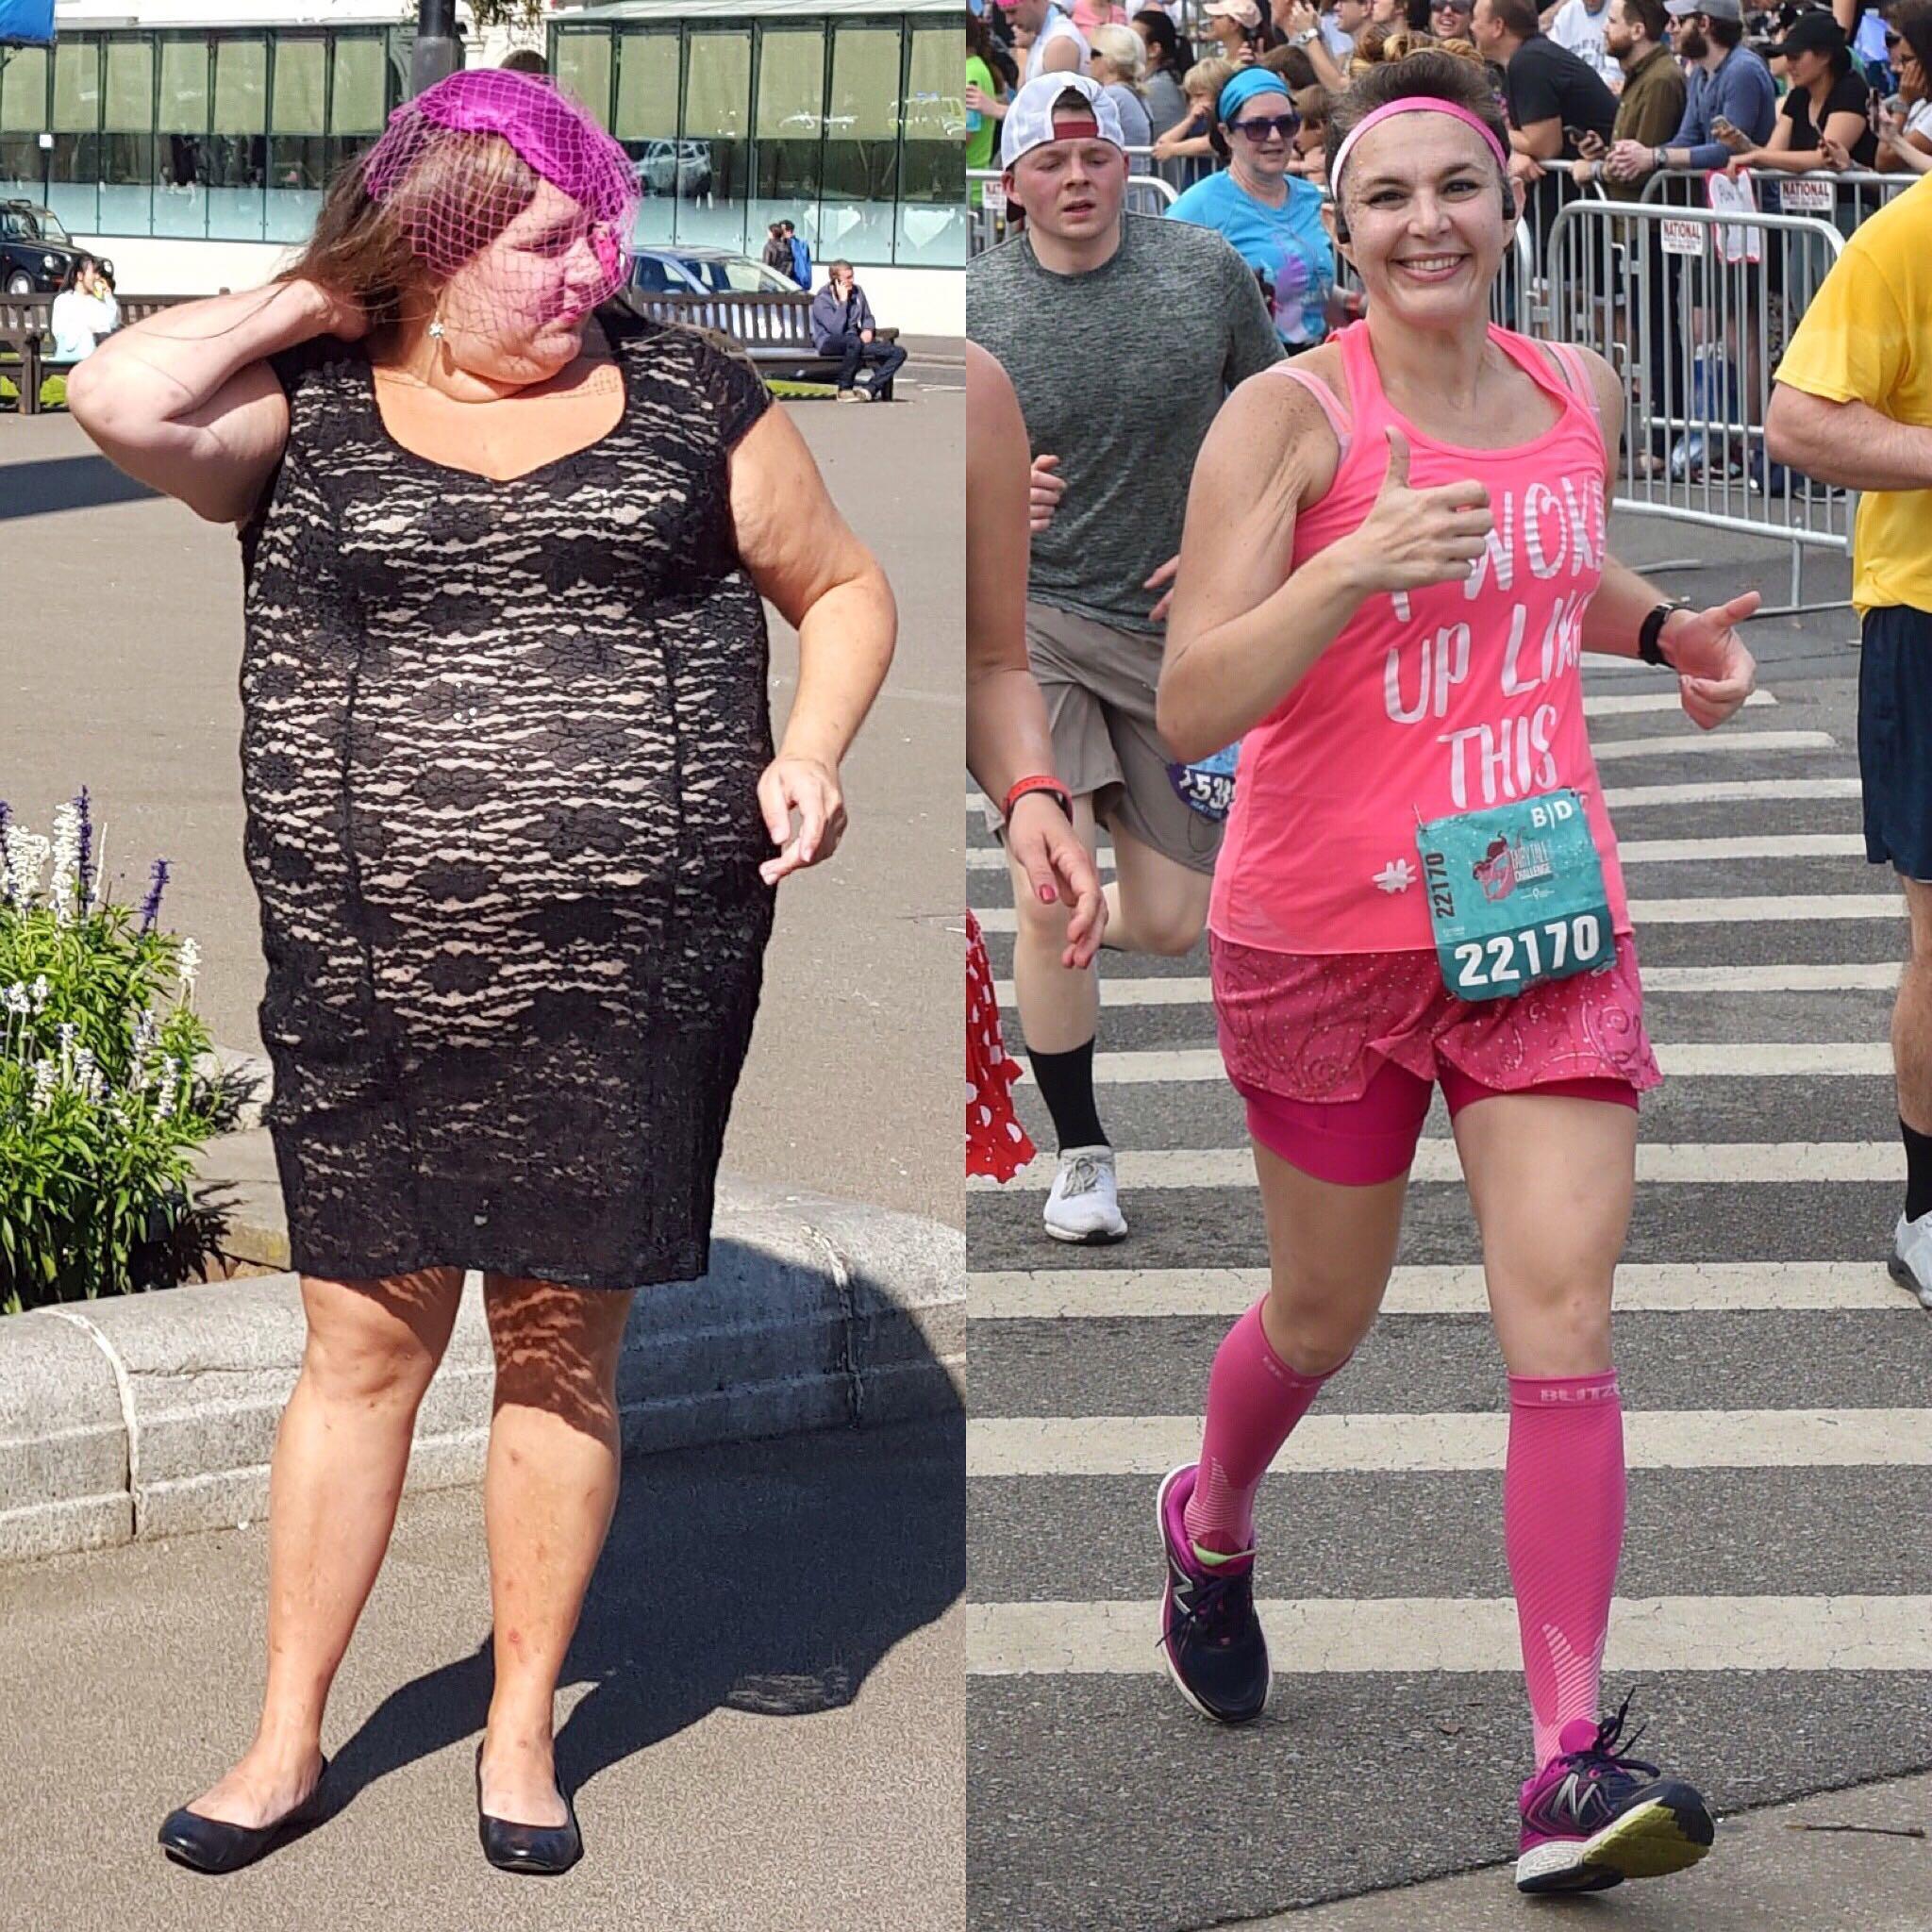 5'7 Female 135 lbs Weight Loss 313 lbs to 178 lbs